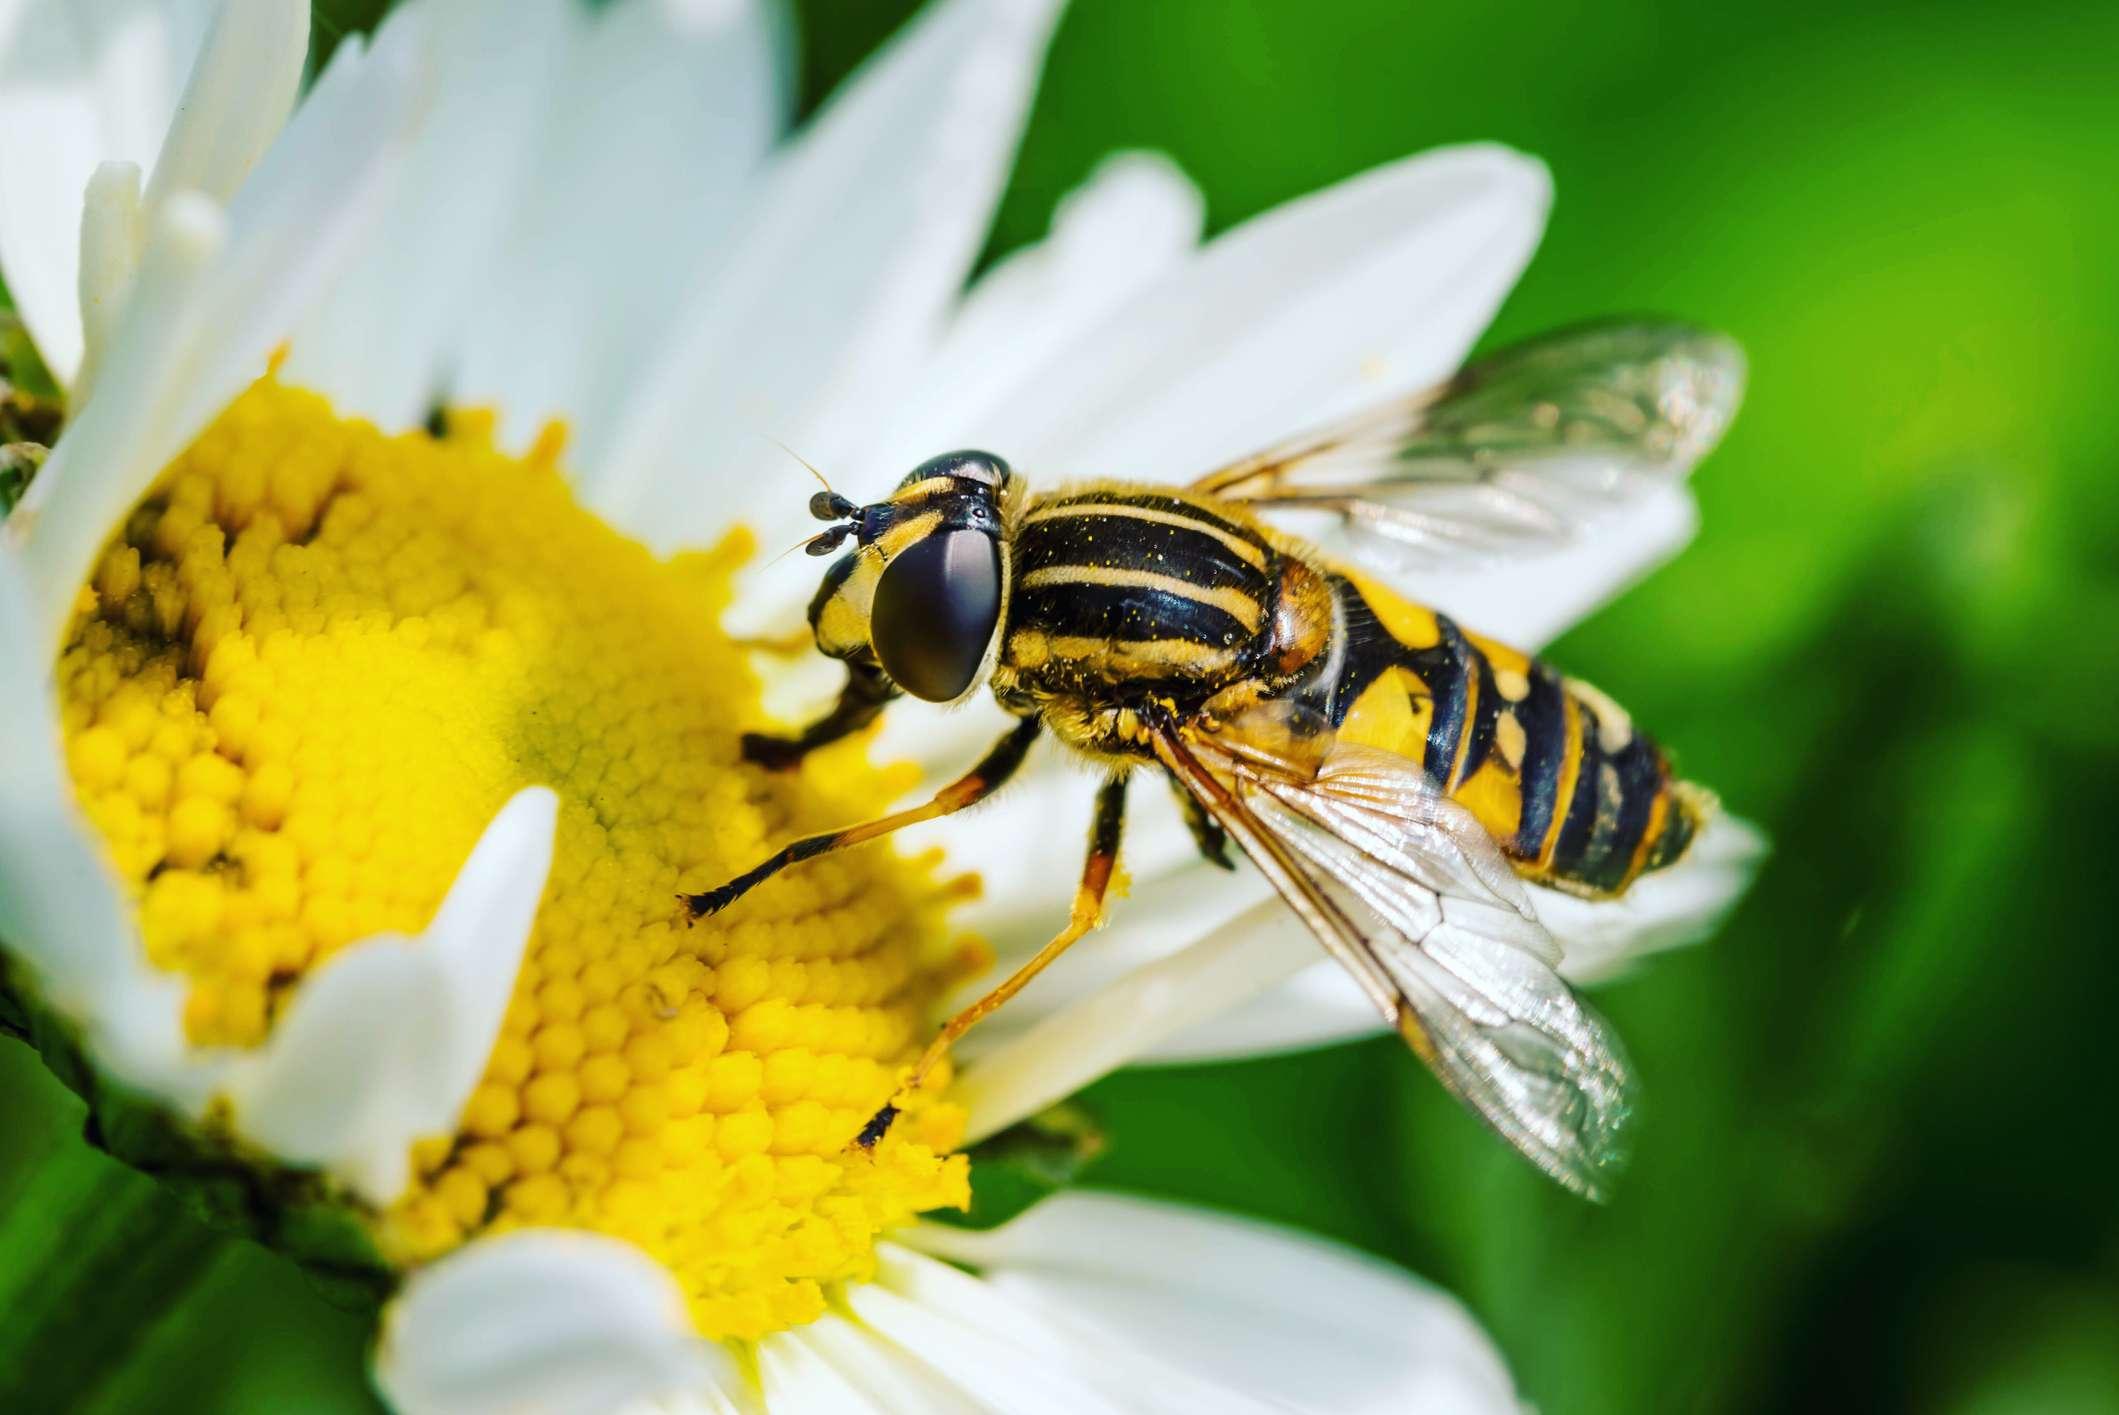 A pollinating wasp in East Boldon, United Kingdom